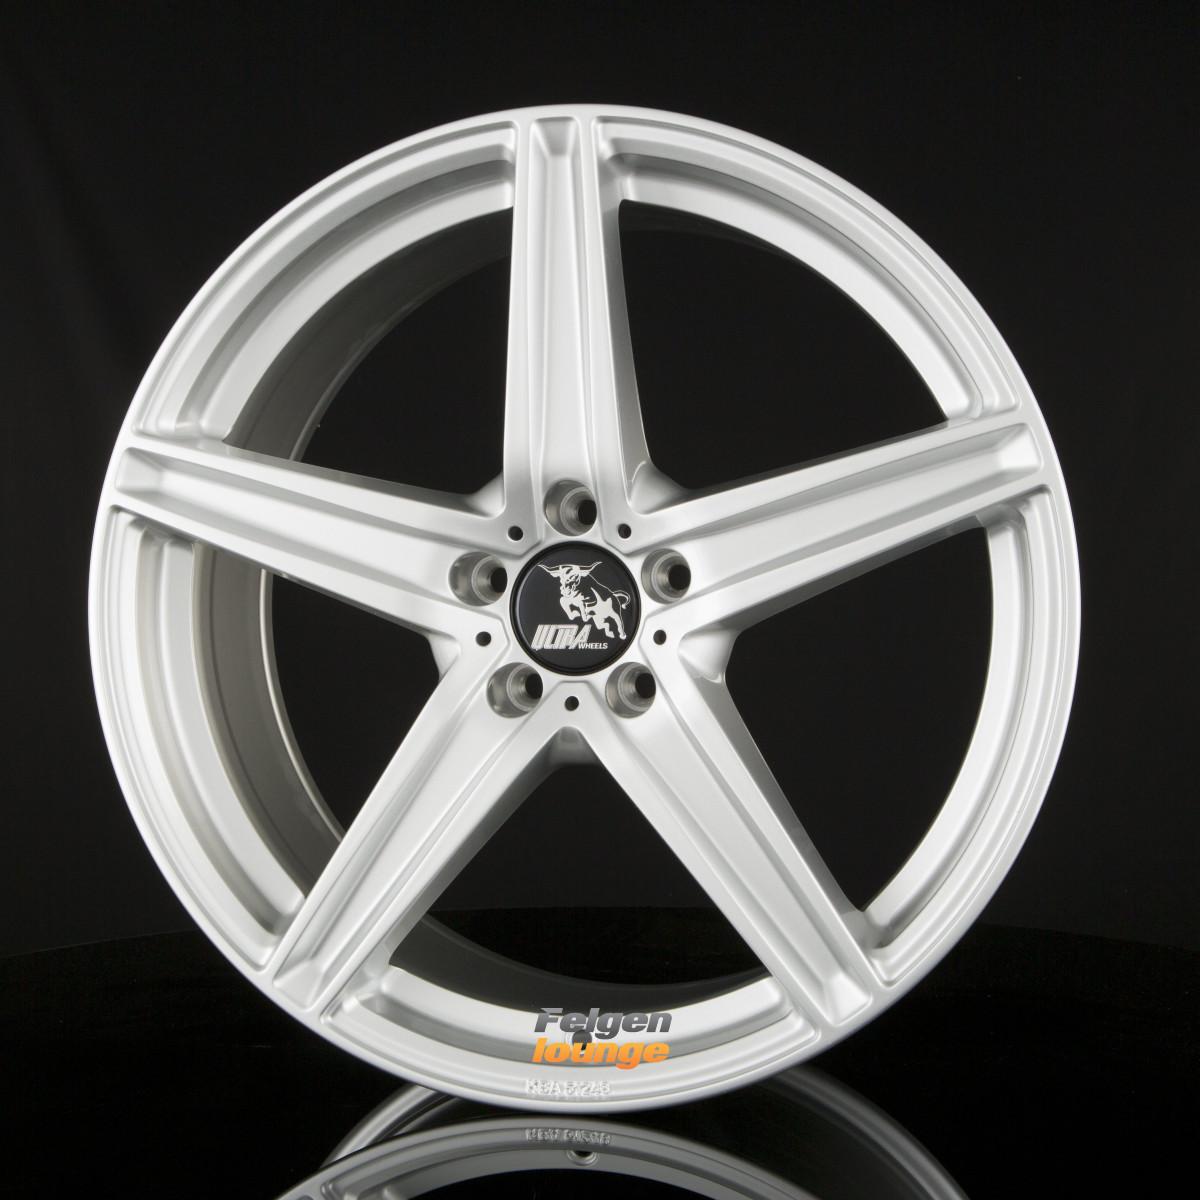 4 alufelgen ultra wheels ua7 silver painted 8x18 et45. Black Bedroom Furniture Sets. Home Design Ideas